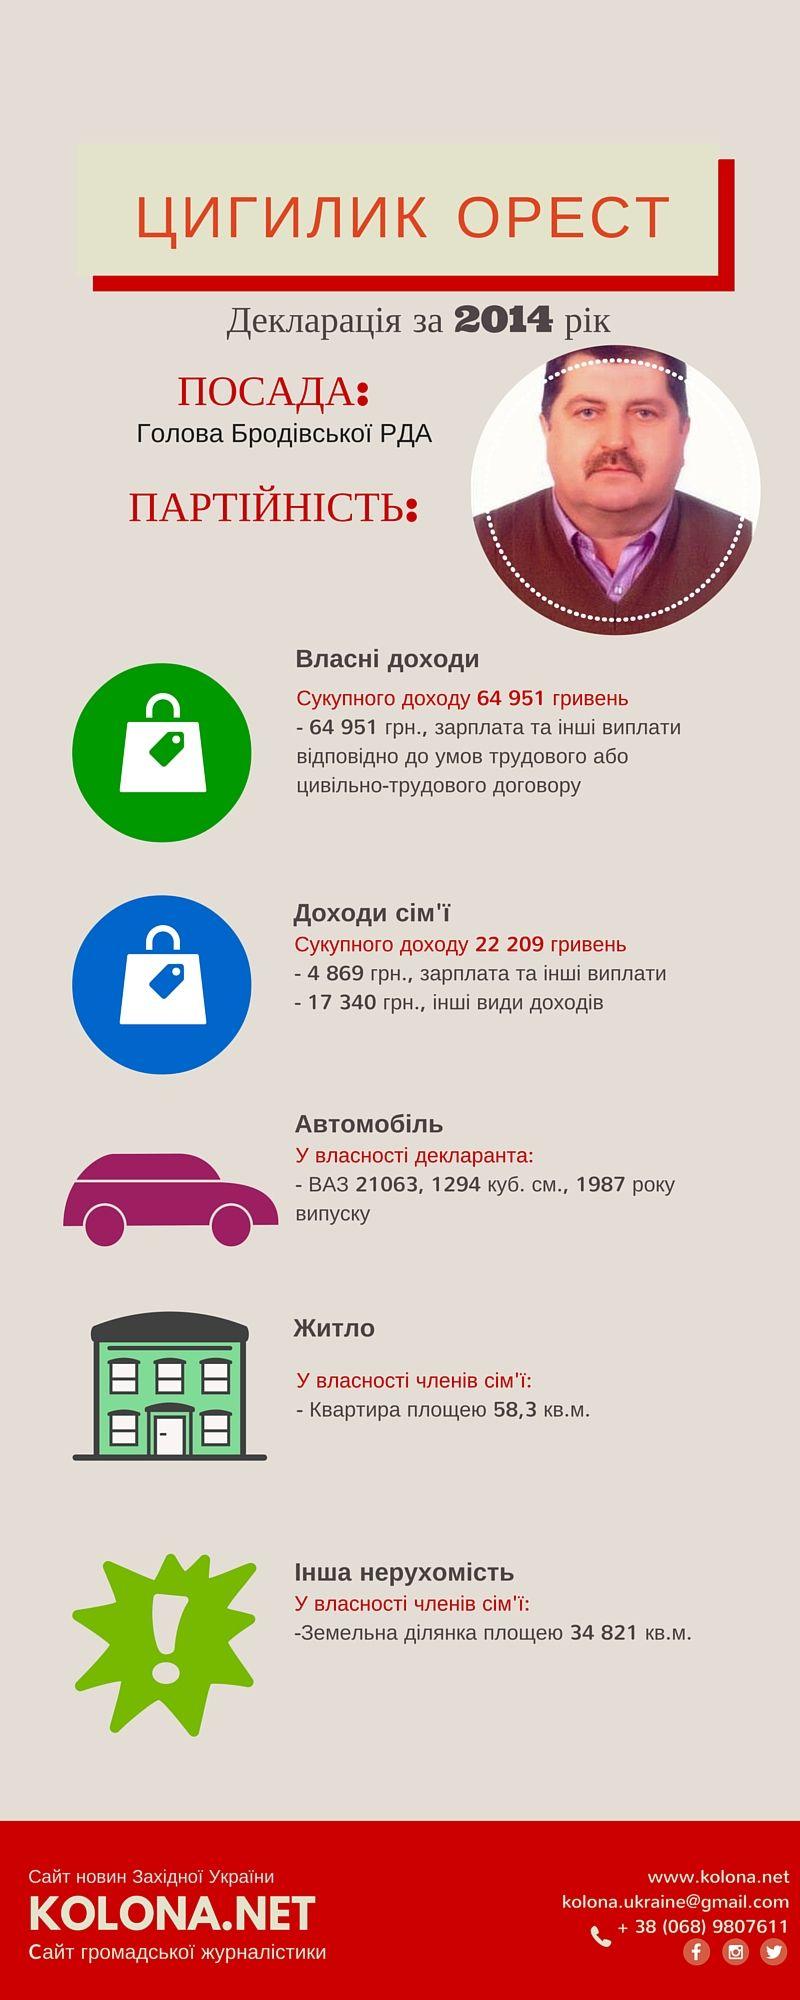 Бродівської РДА - Цигилик Орест